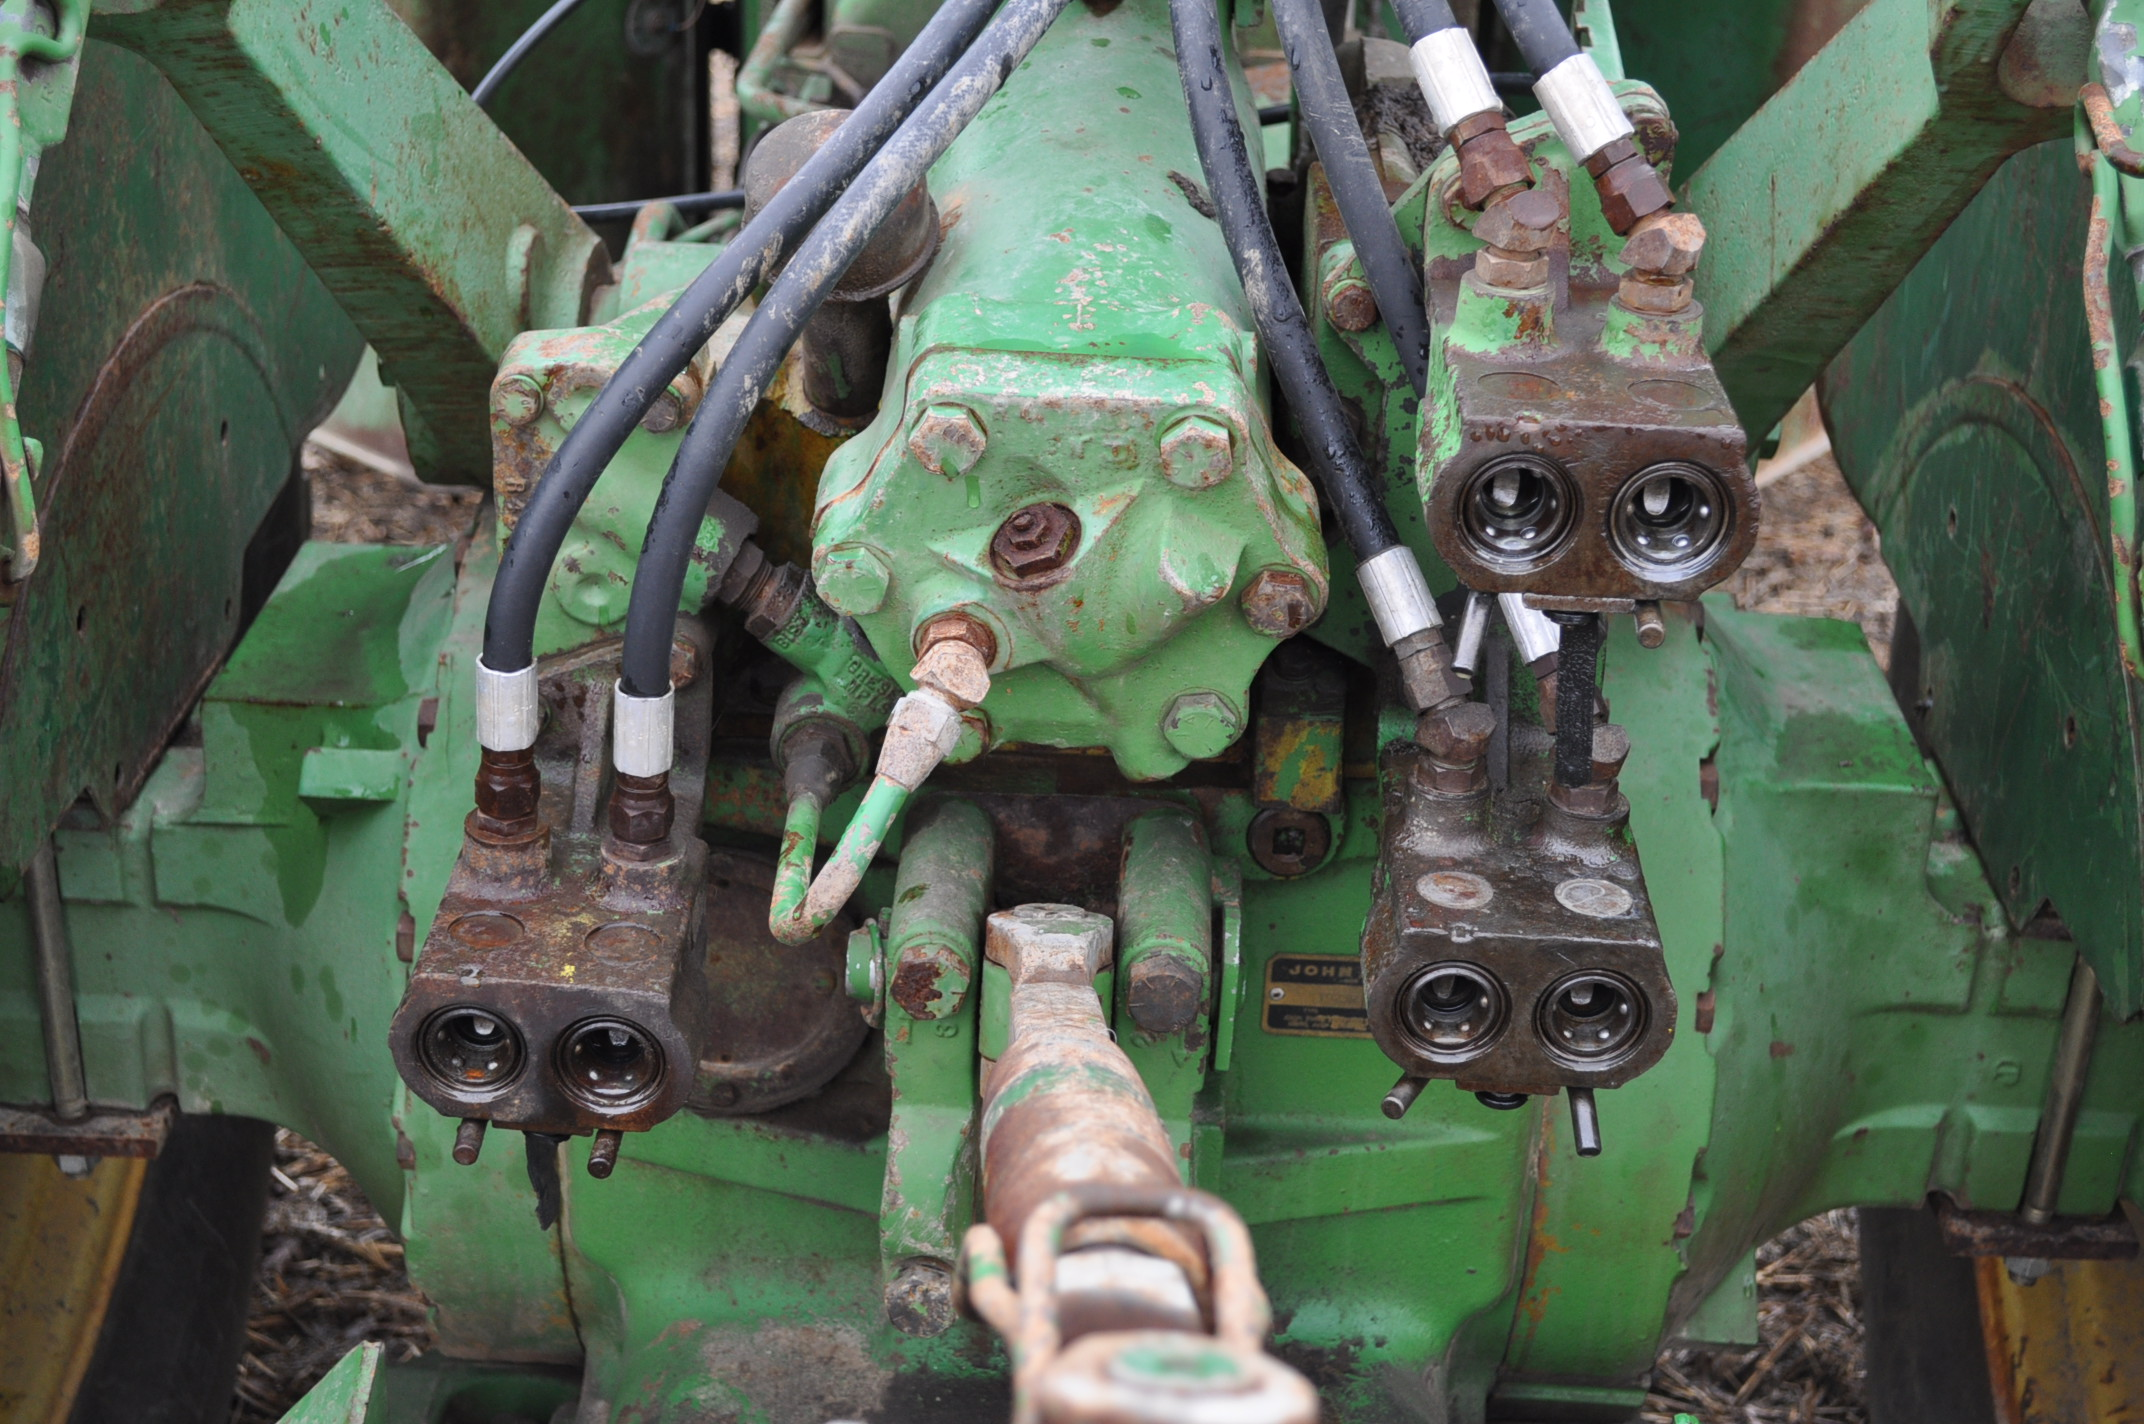 John Deere 7520 tractor, 4WD, diesel, 18.4-34 duals, original fenders, CHA, cab interior kit, 3 - Image 12 of 24